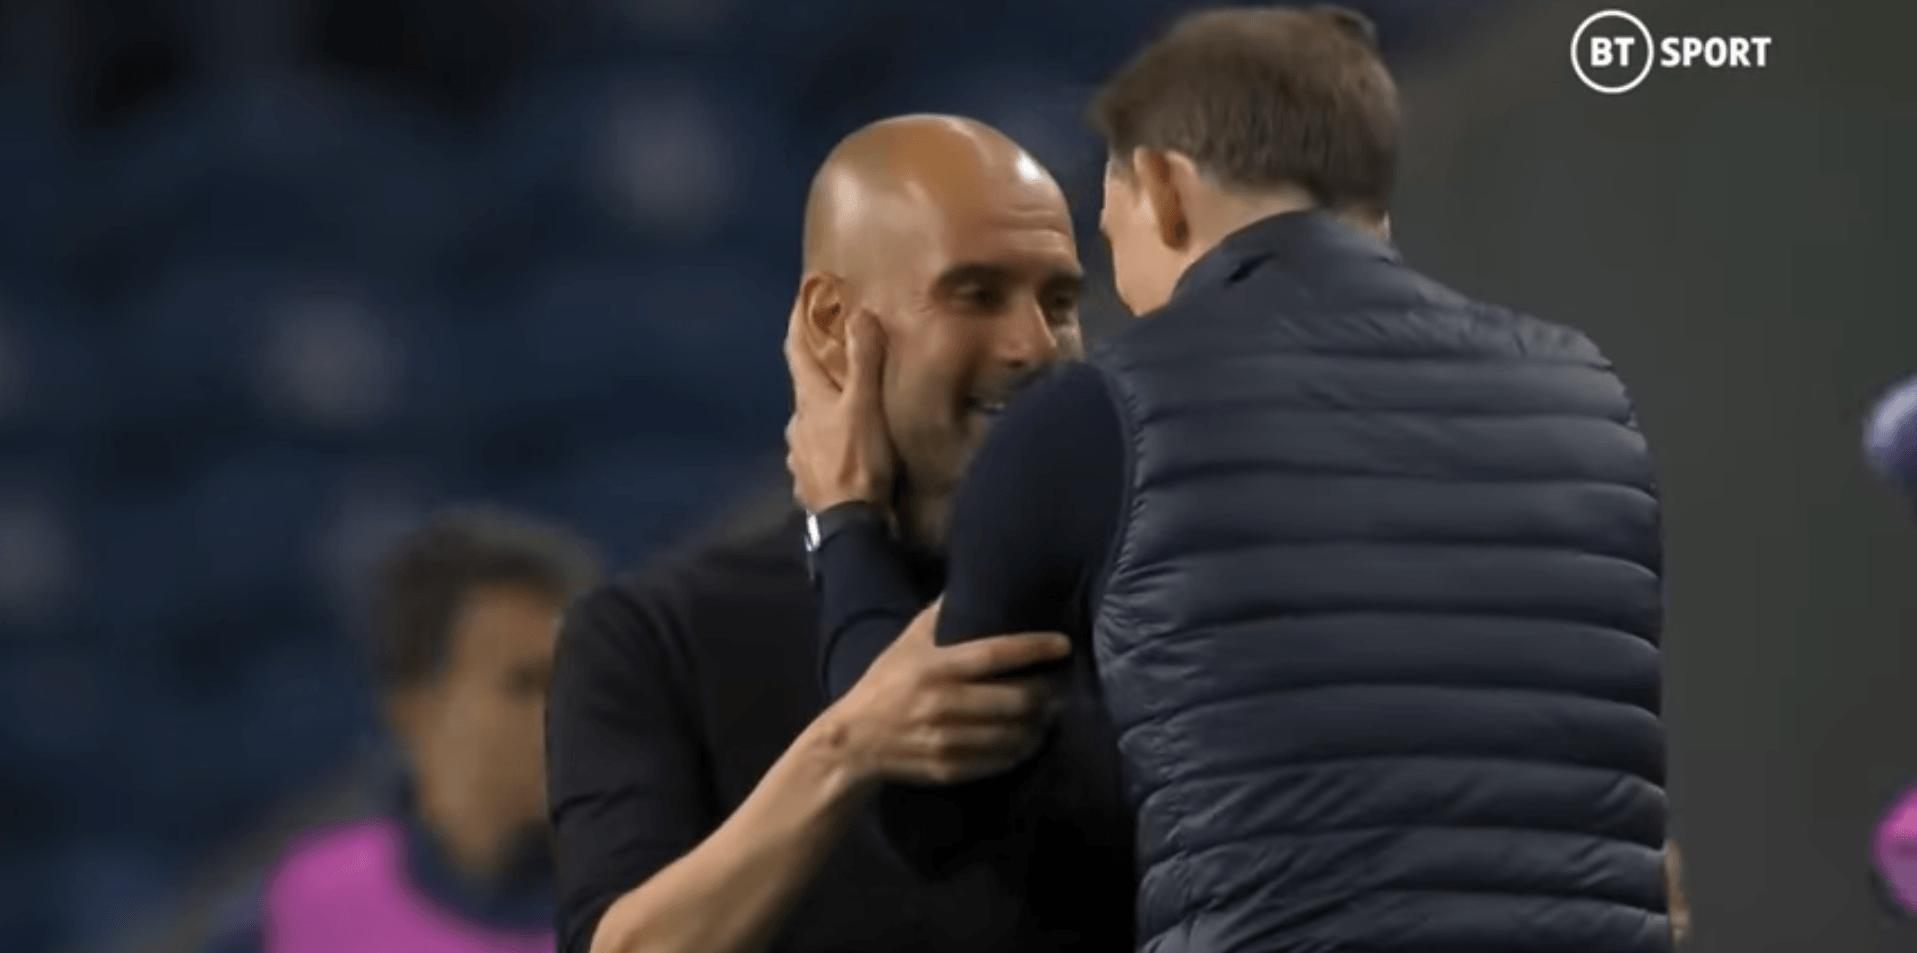 Thomas Tuchel comforting Guardiola